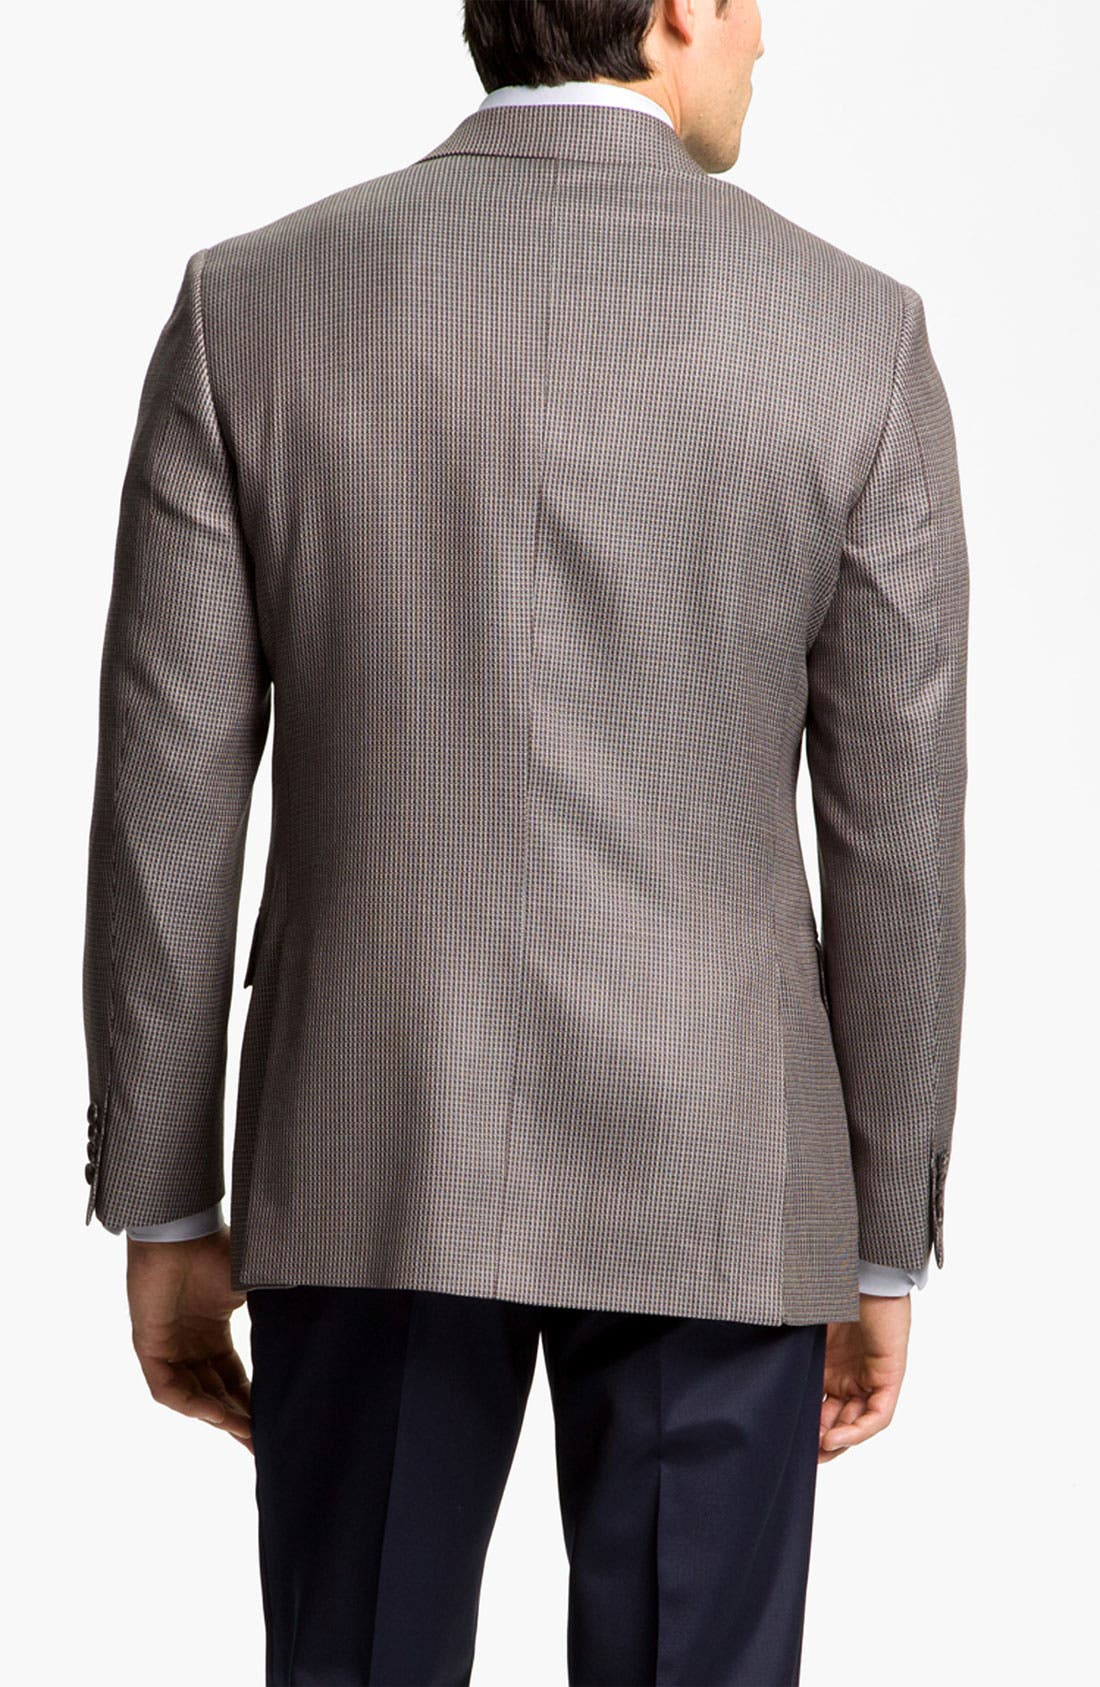 Alternate Image 2  - Joseph Abboud 'Signature Silver' Sportcoat